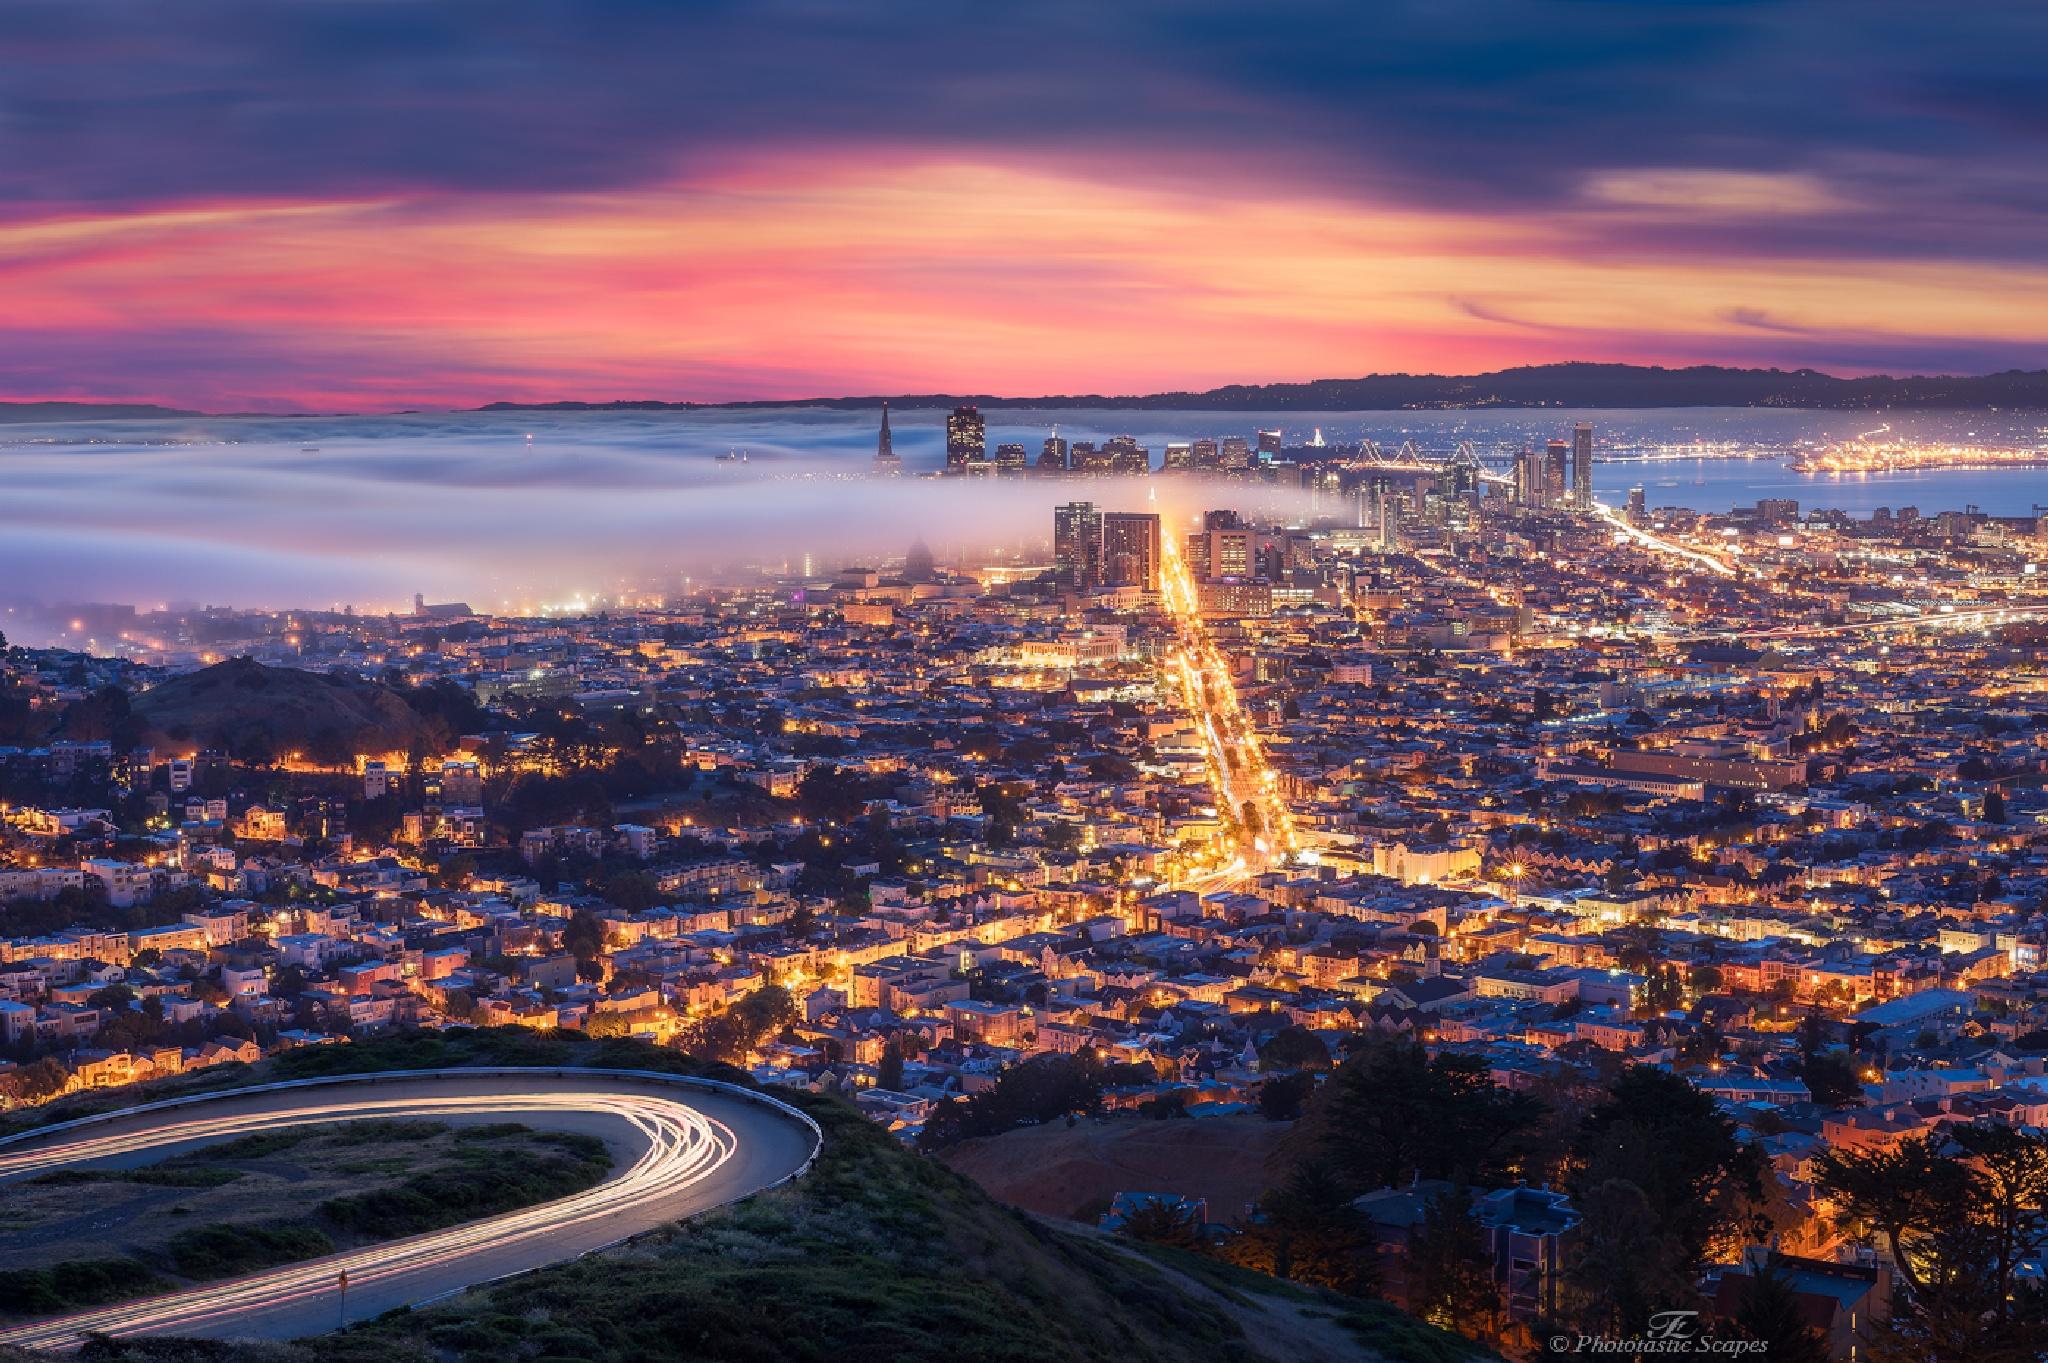 City of Dreams by Farhan Zaidi